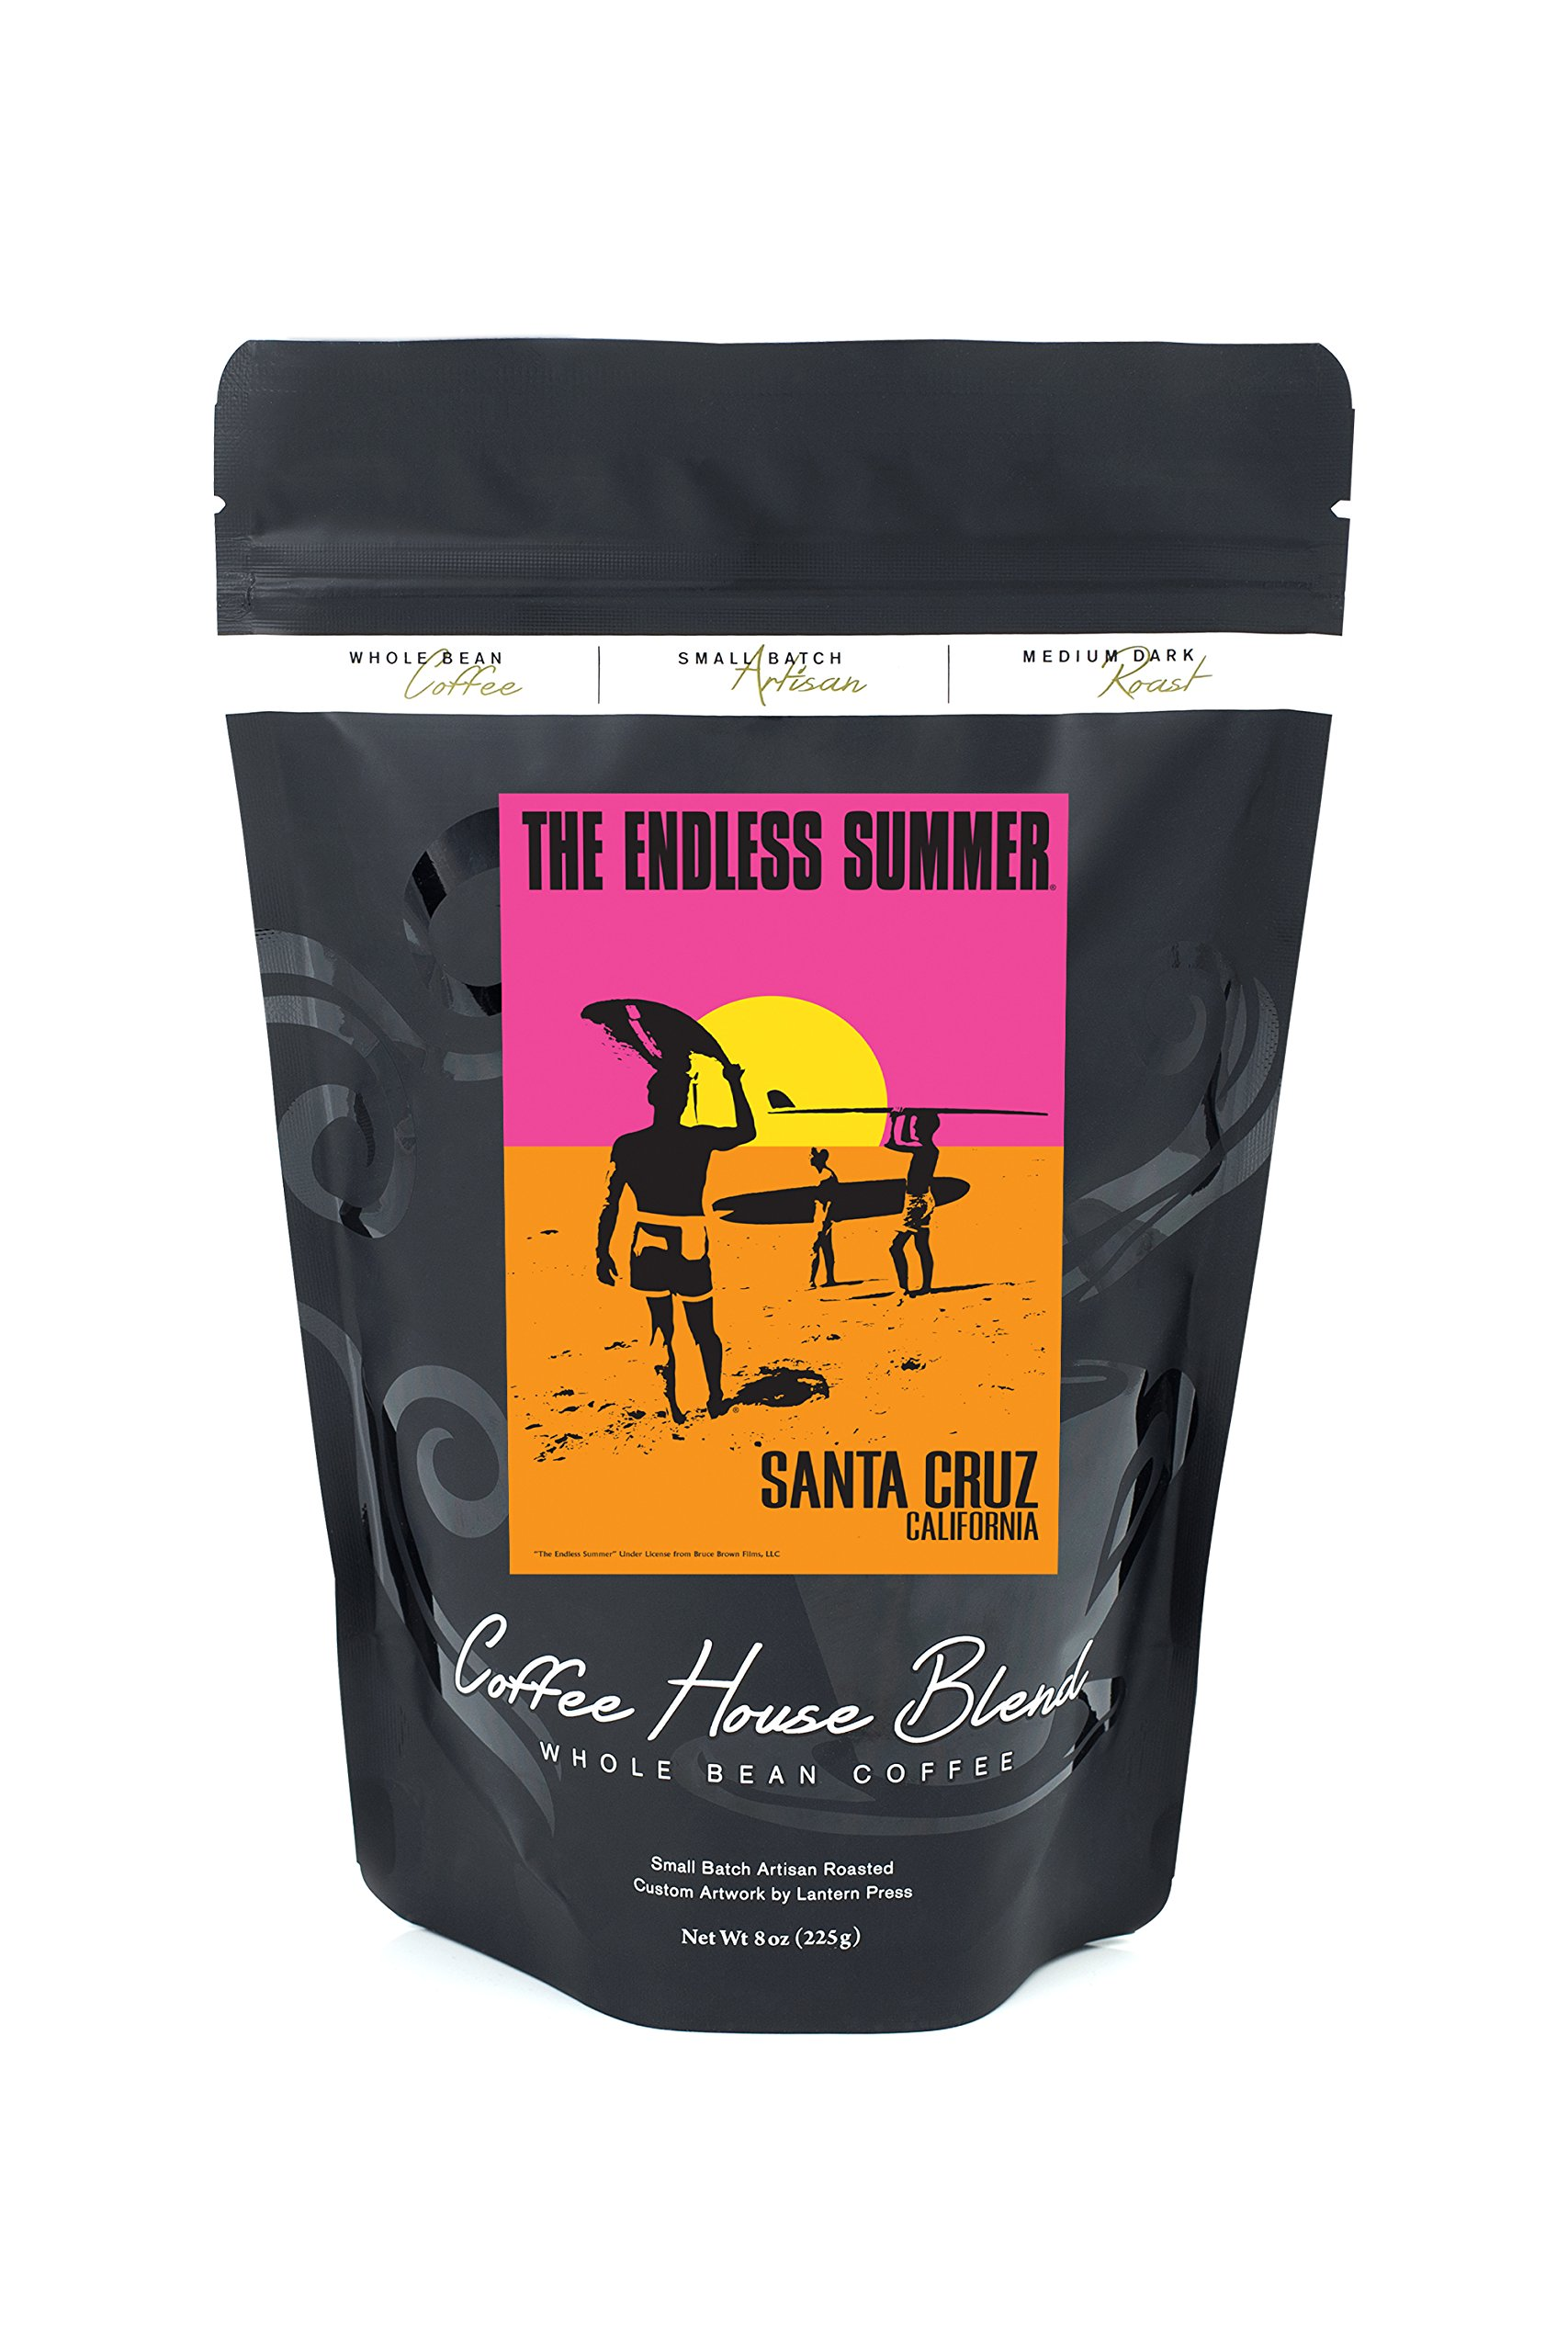 The Endless Summer - Santa Cruz, California - Original Movie Poster (8oz Whole Bean Small Batch Artisan Coffee - Bold & Strong Medium Dark Roast w/ Artwork)